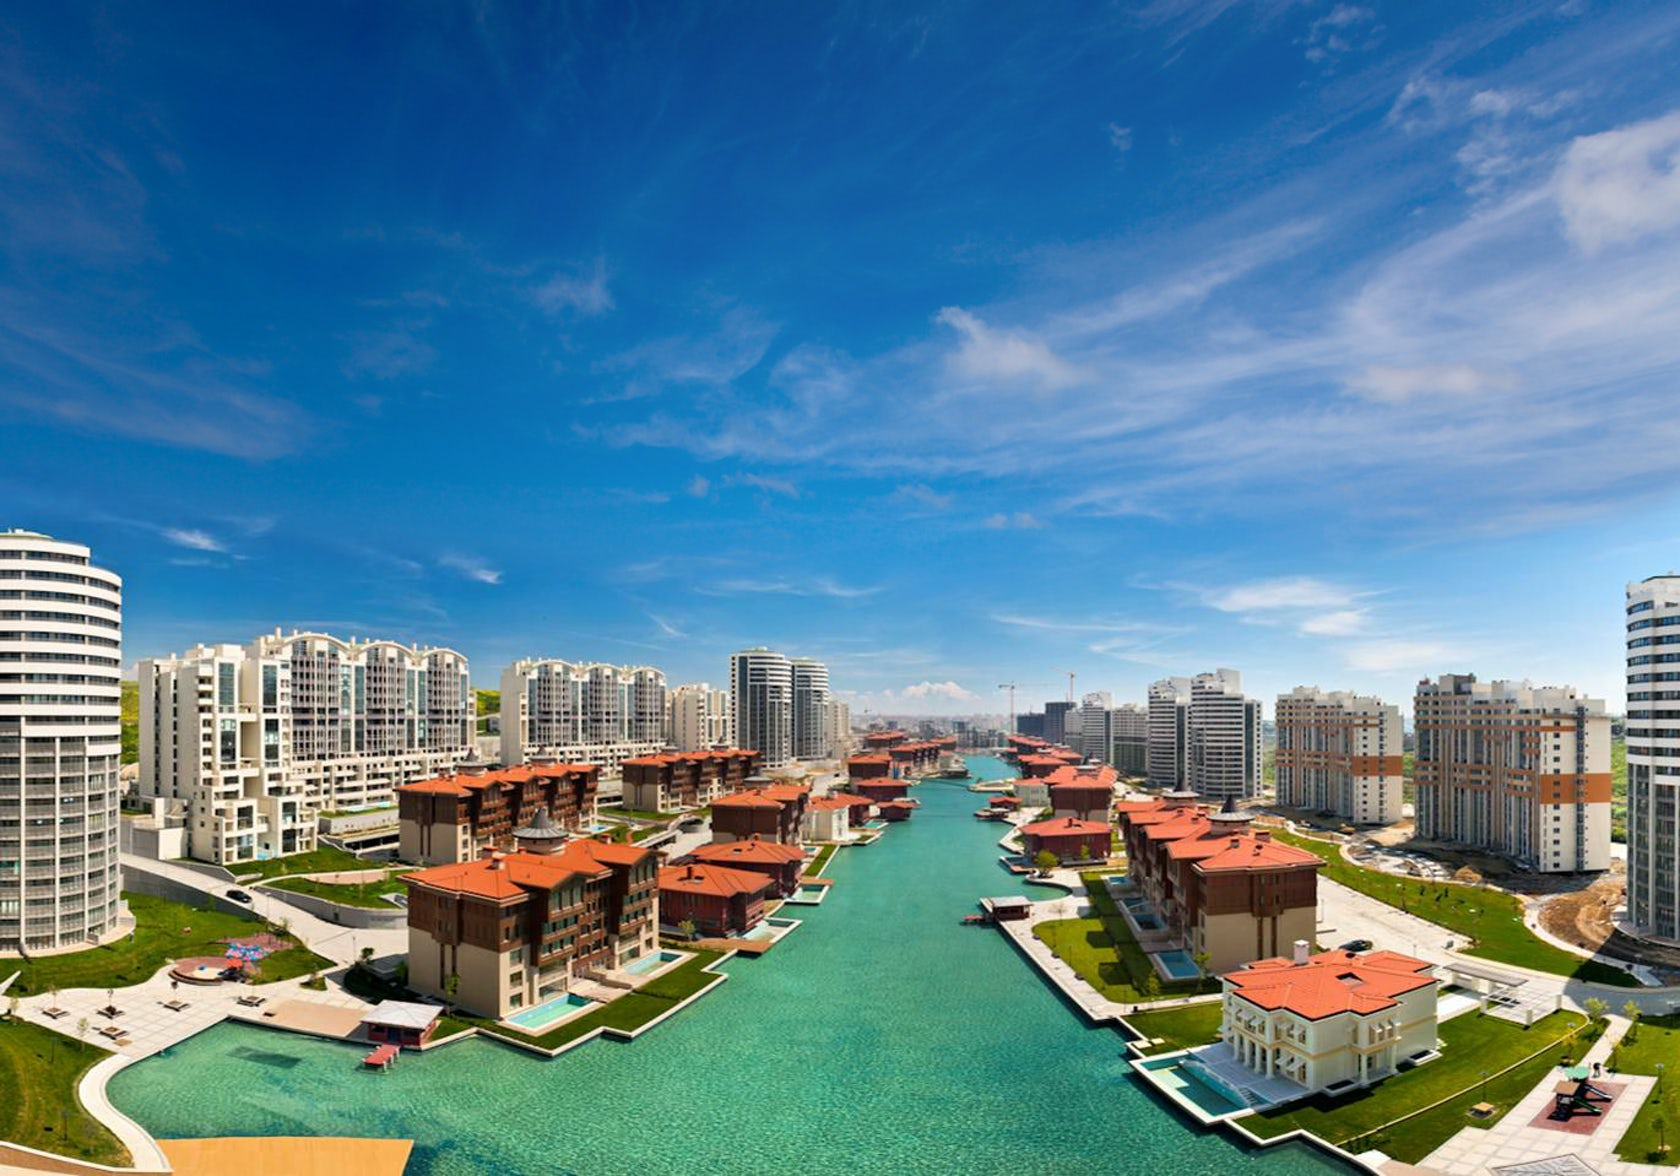 Bosphorus City On Architizer